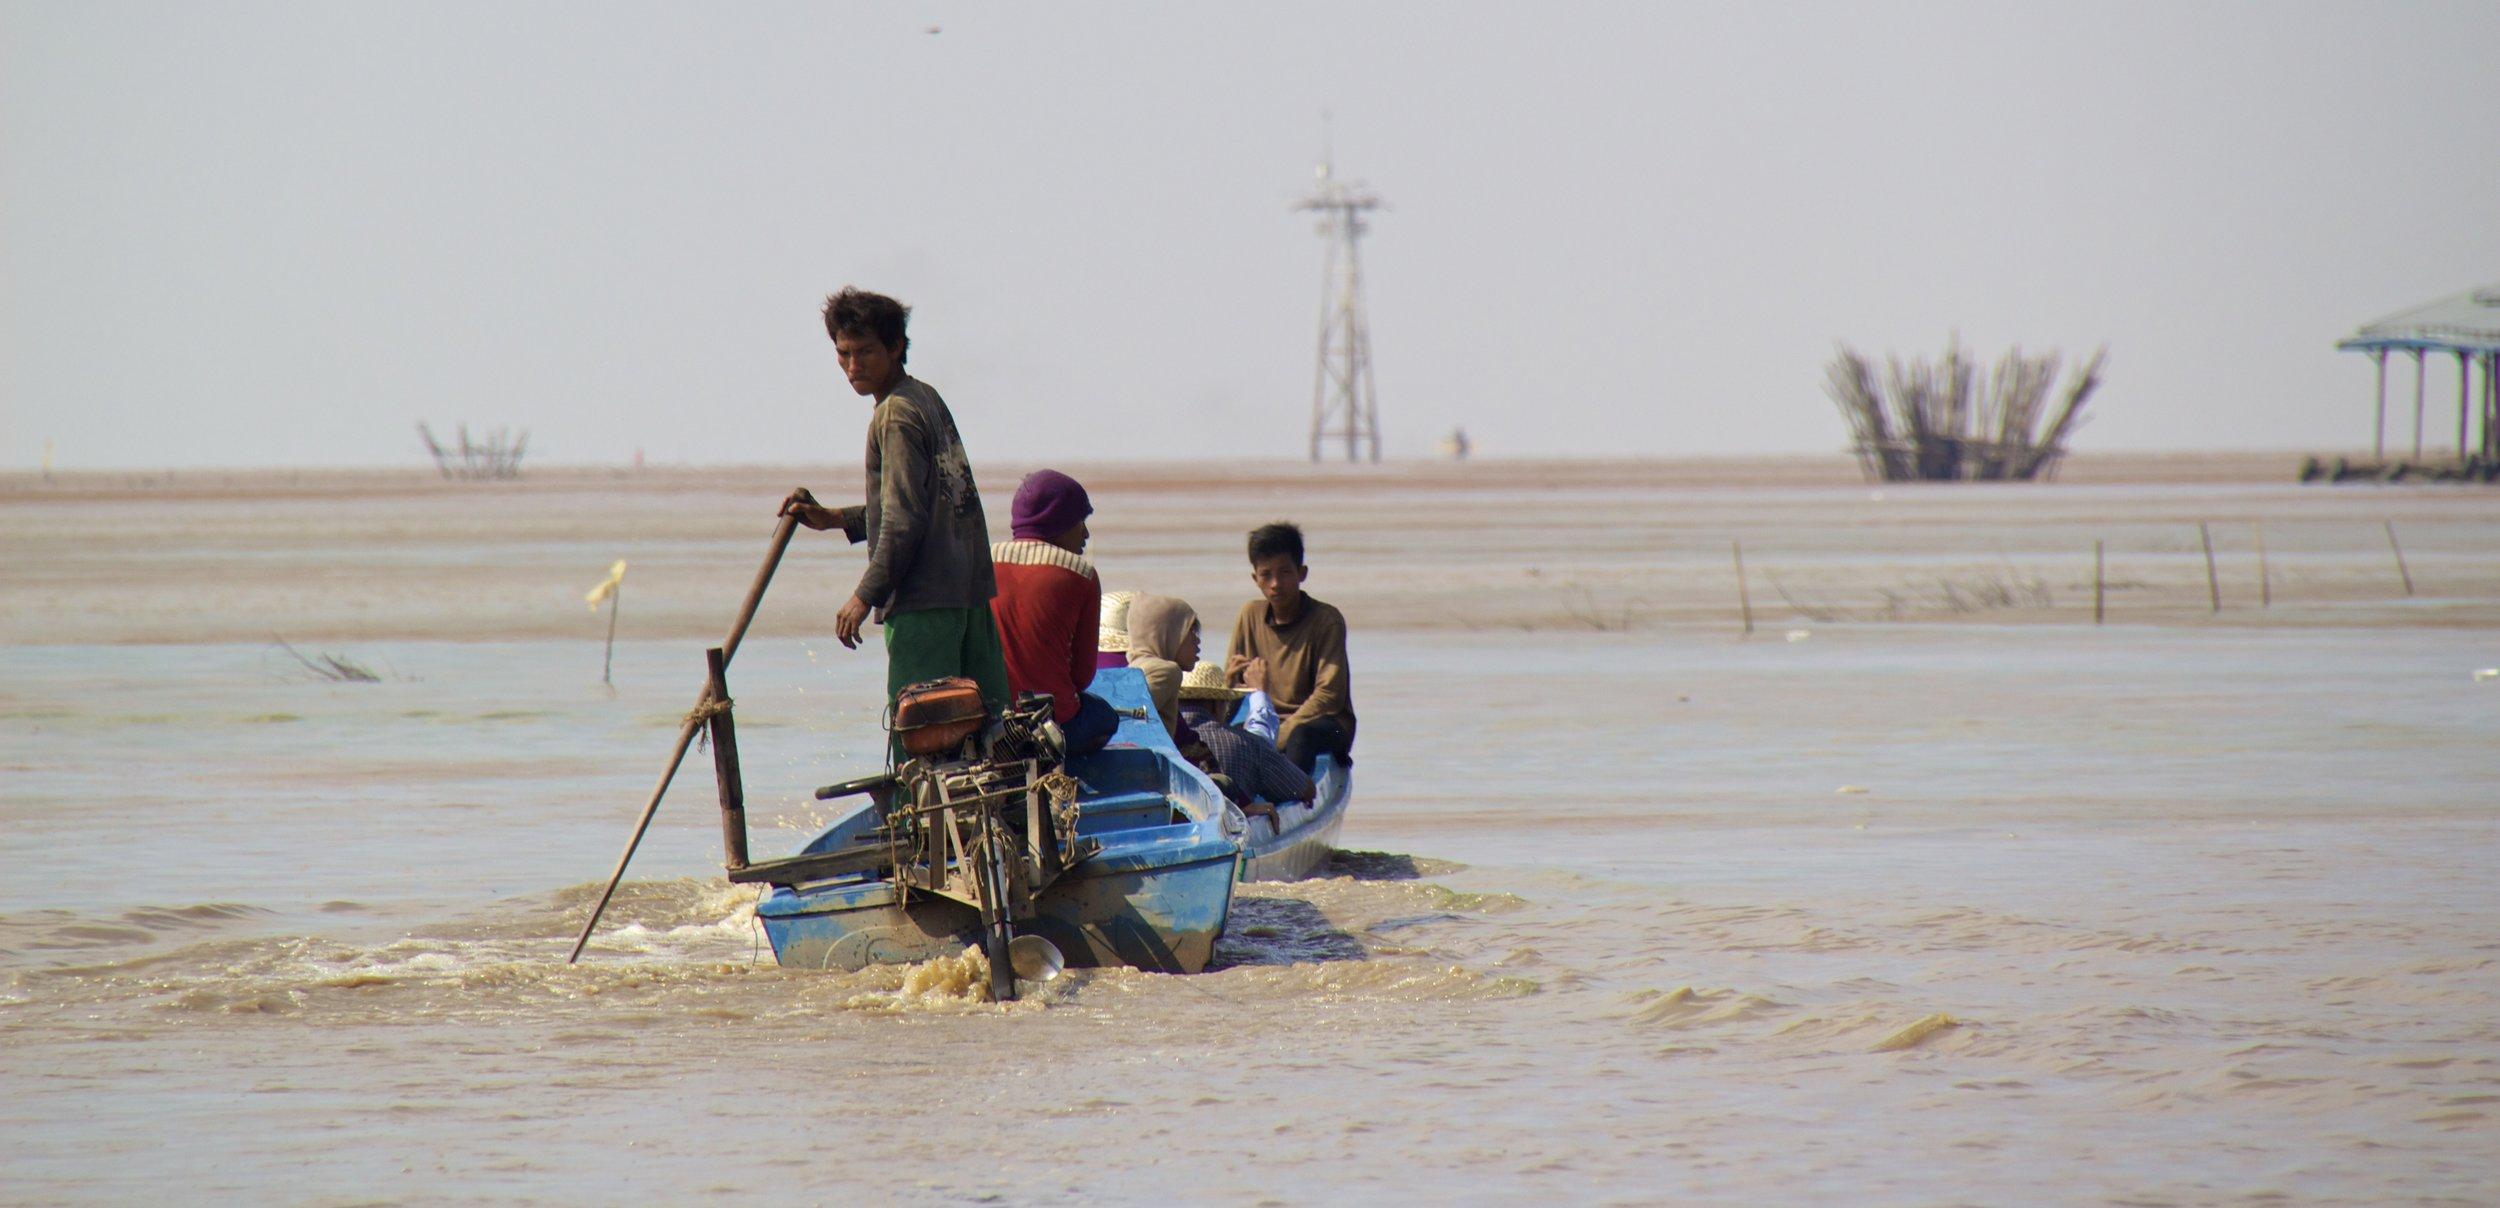 tonle sap siem reap cambodia floating villages 9.jpg